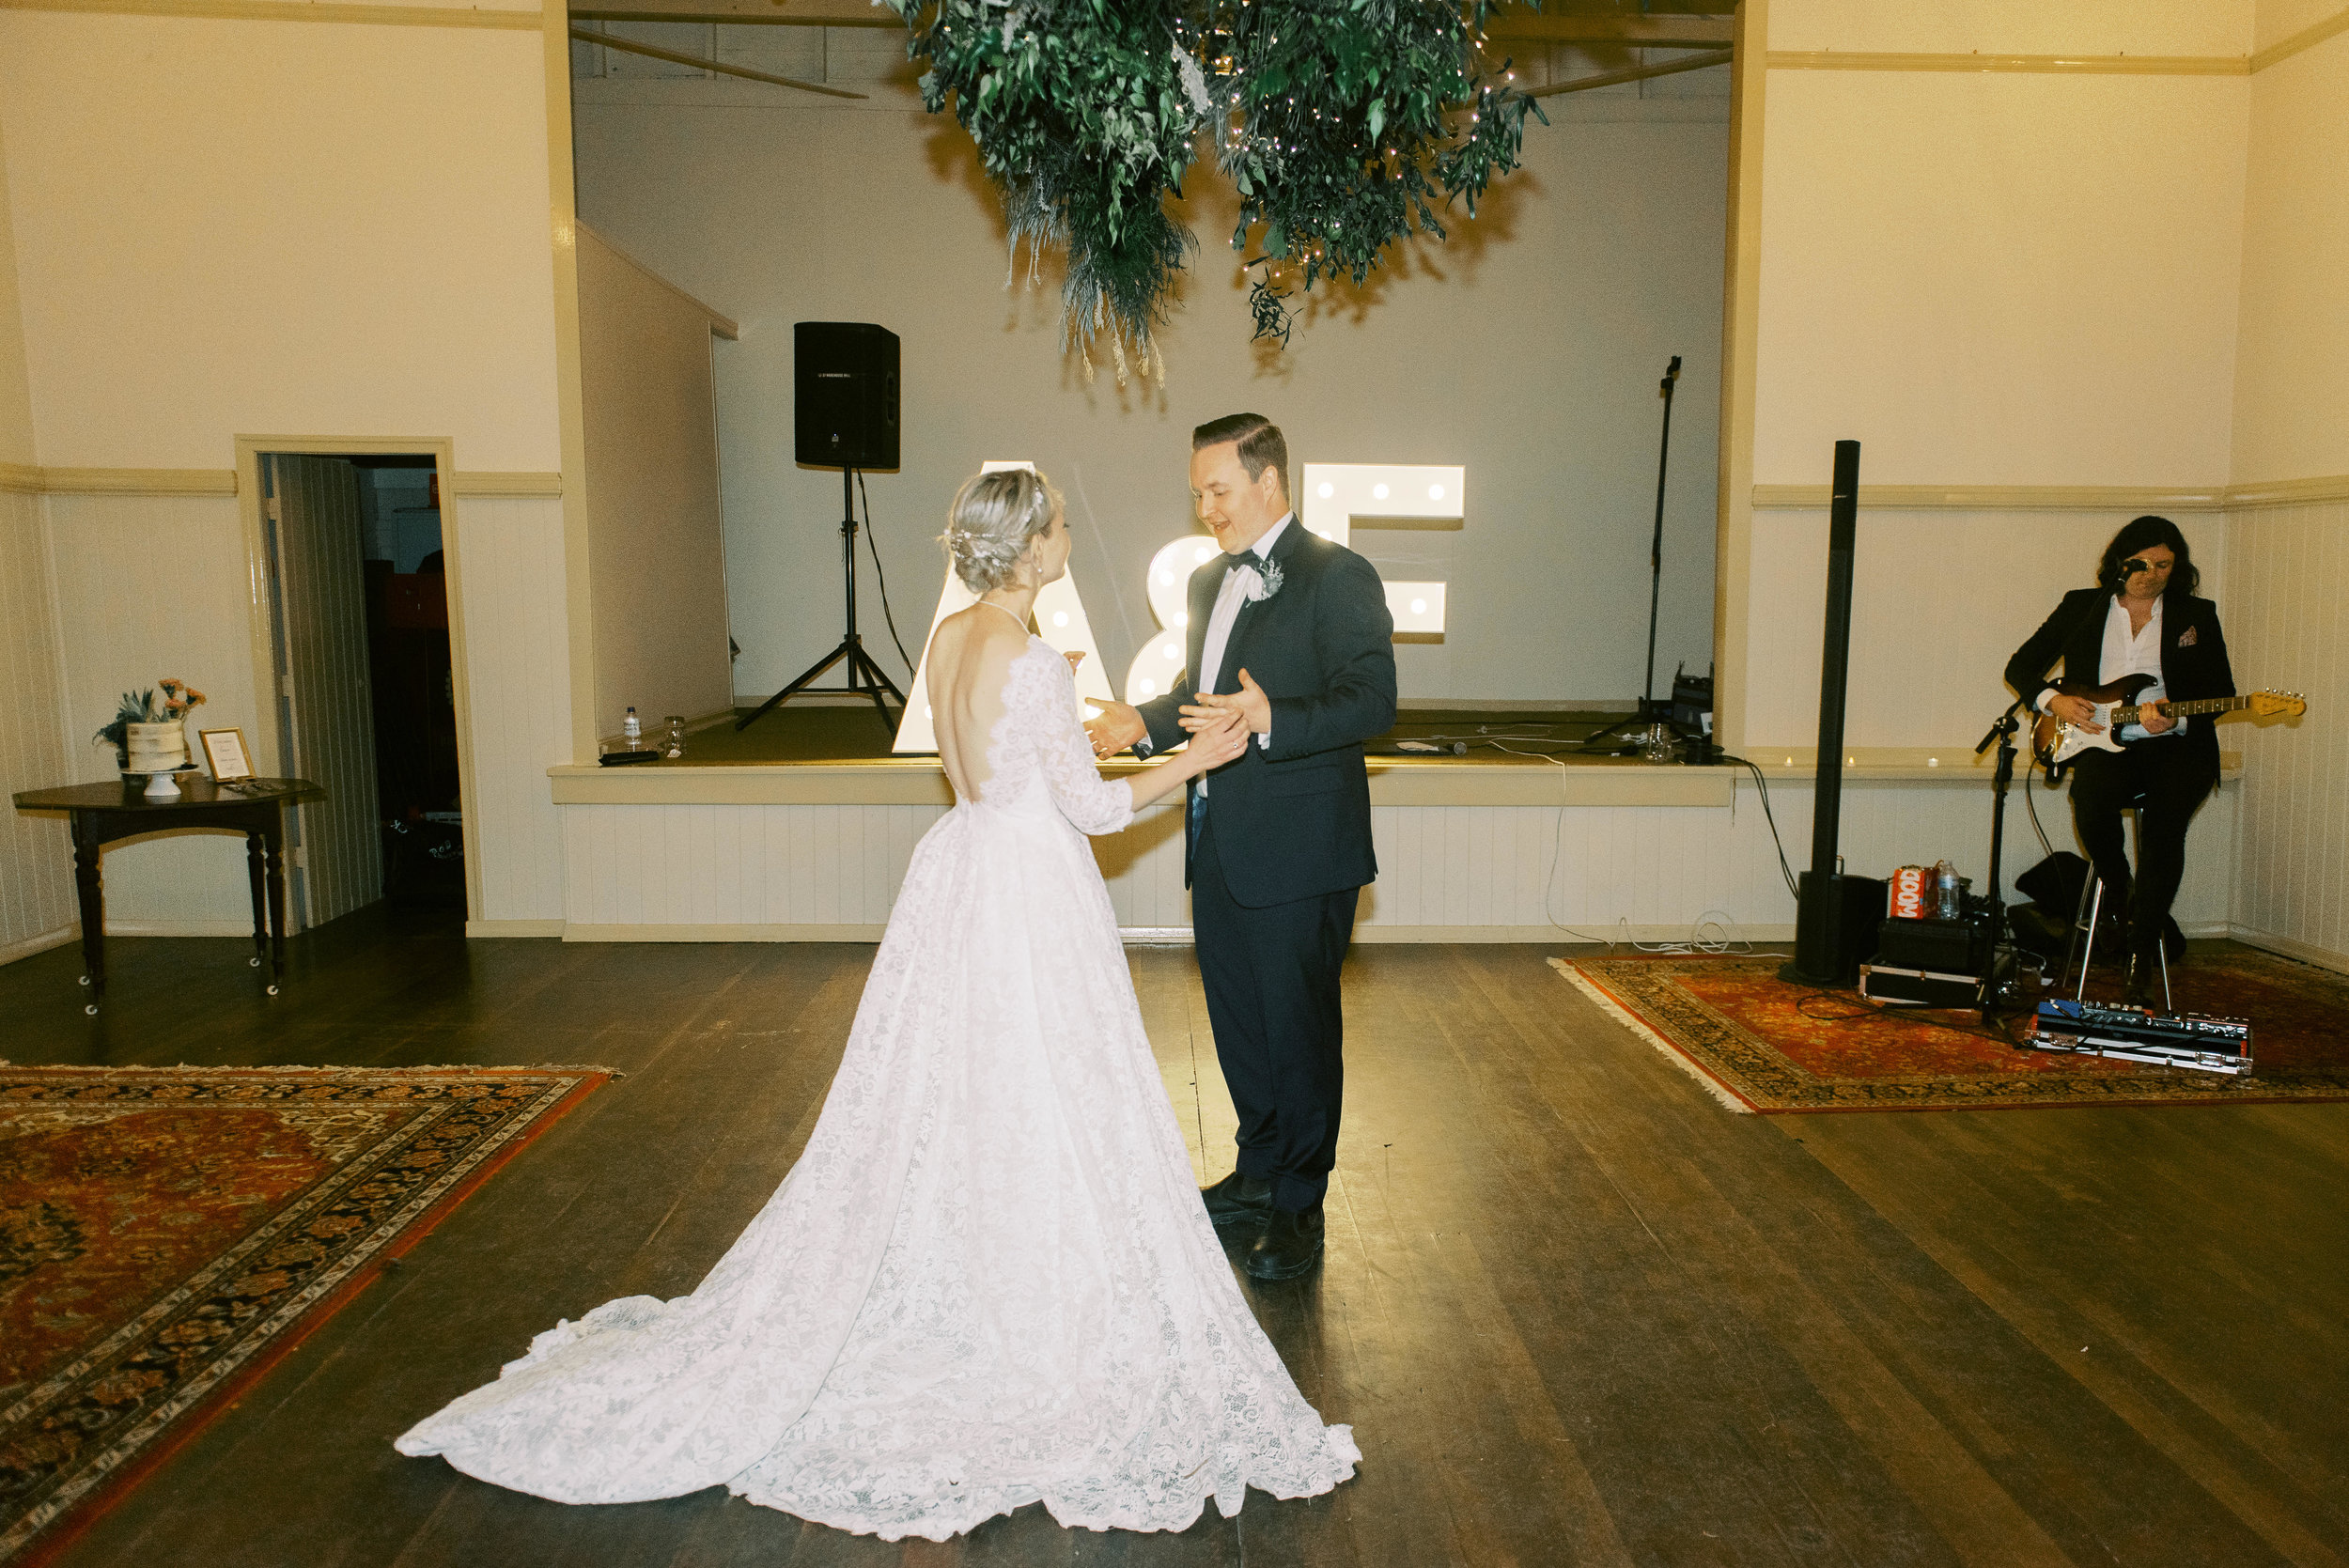 brisbane-gold-coast-sunshine-coast-tweed-romantic-fine-art-wedding-photography-lauren-olivia-79.jpg